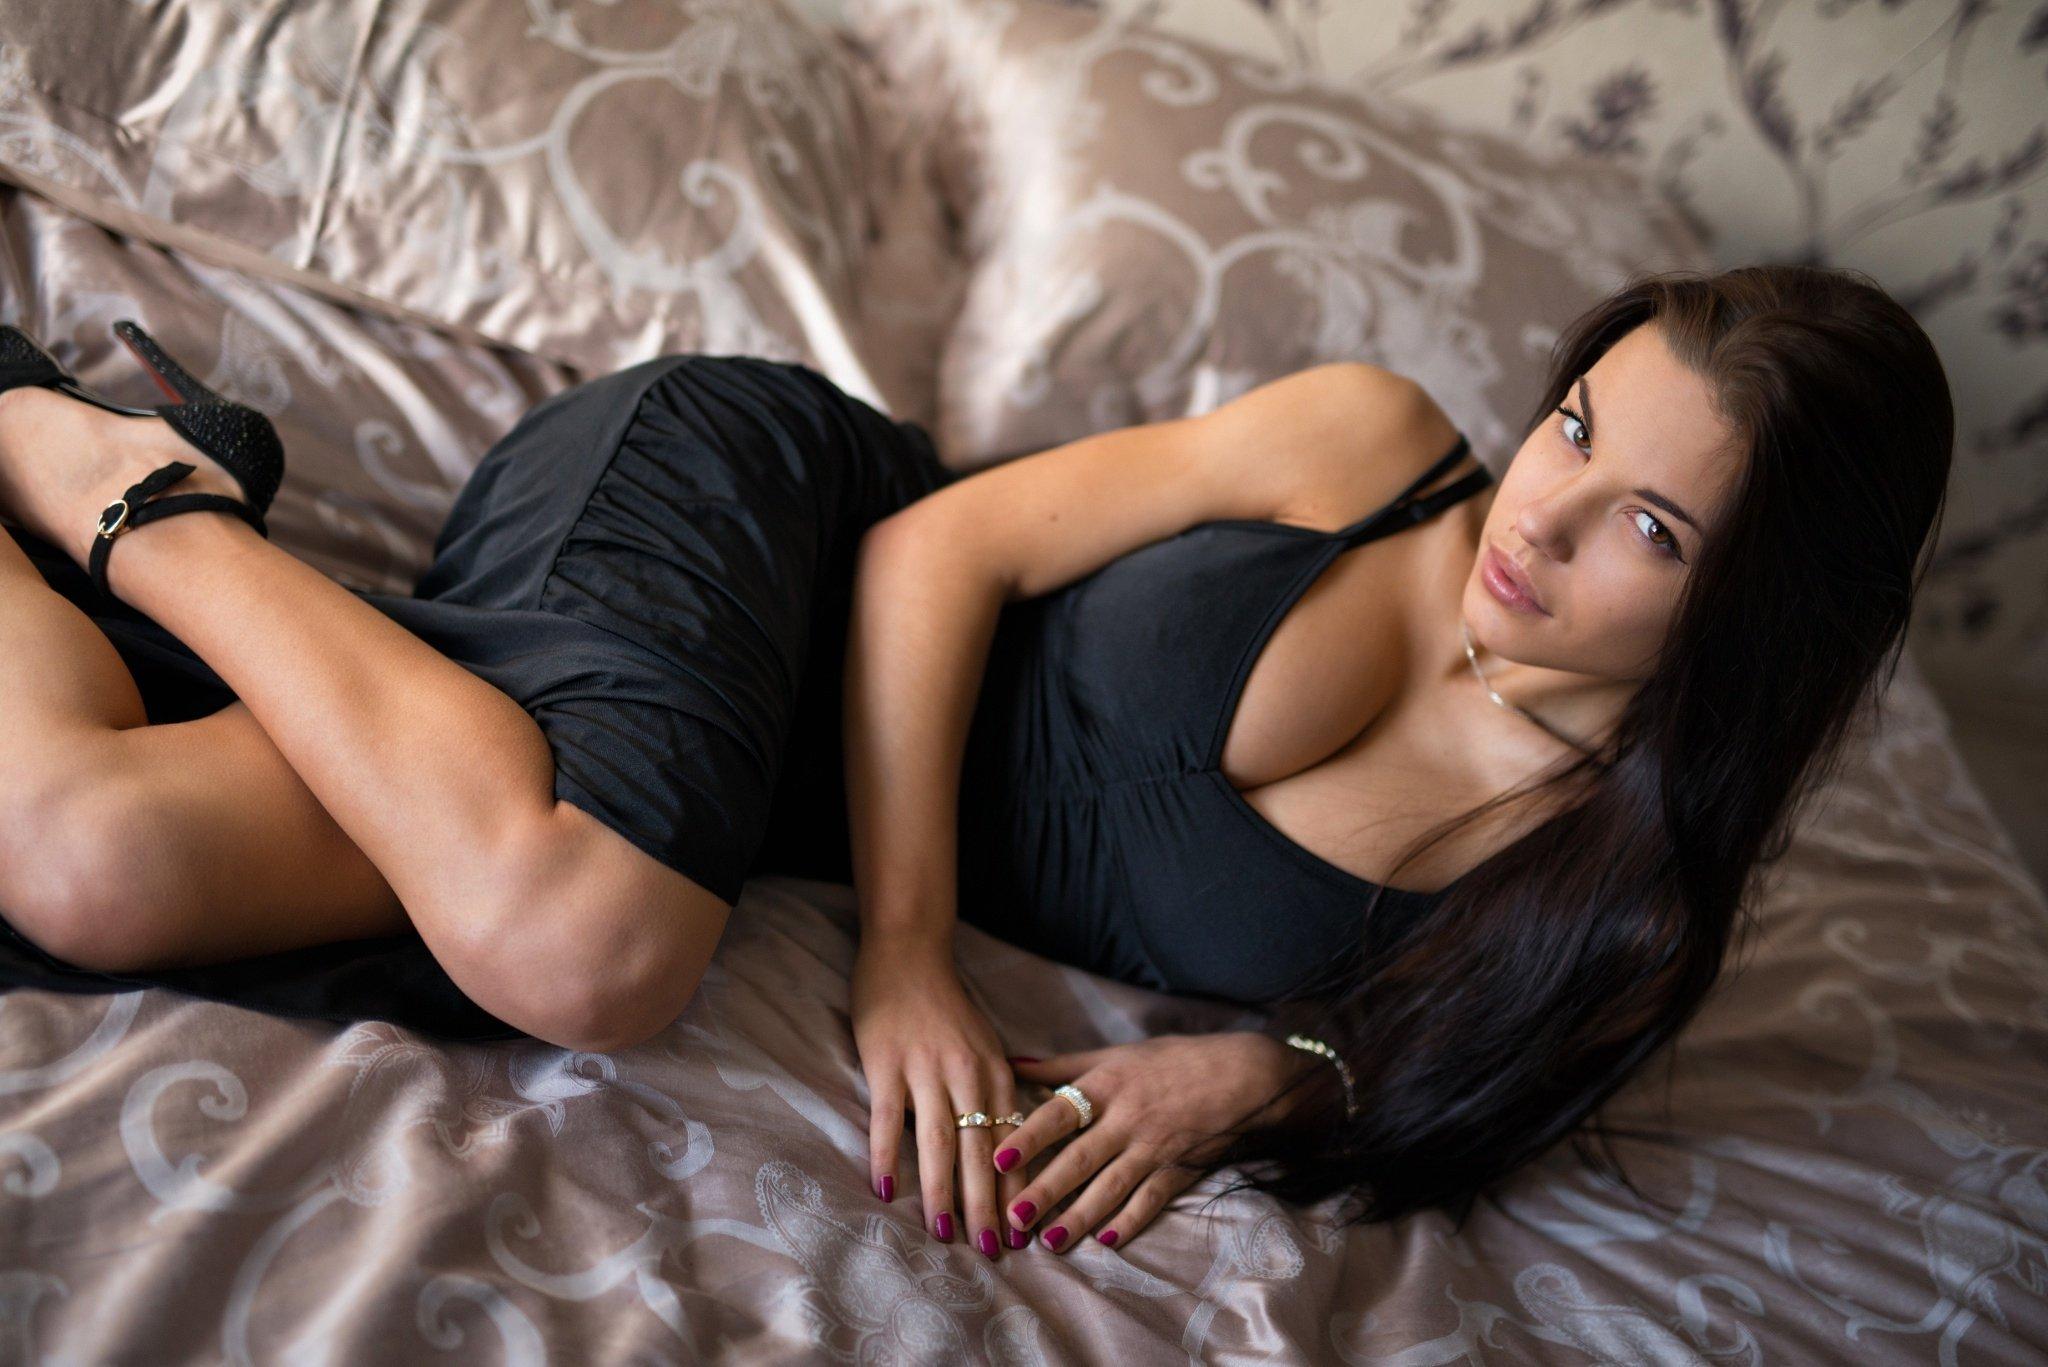 Шлюхи индивидуалки харьков проститутки савинск